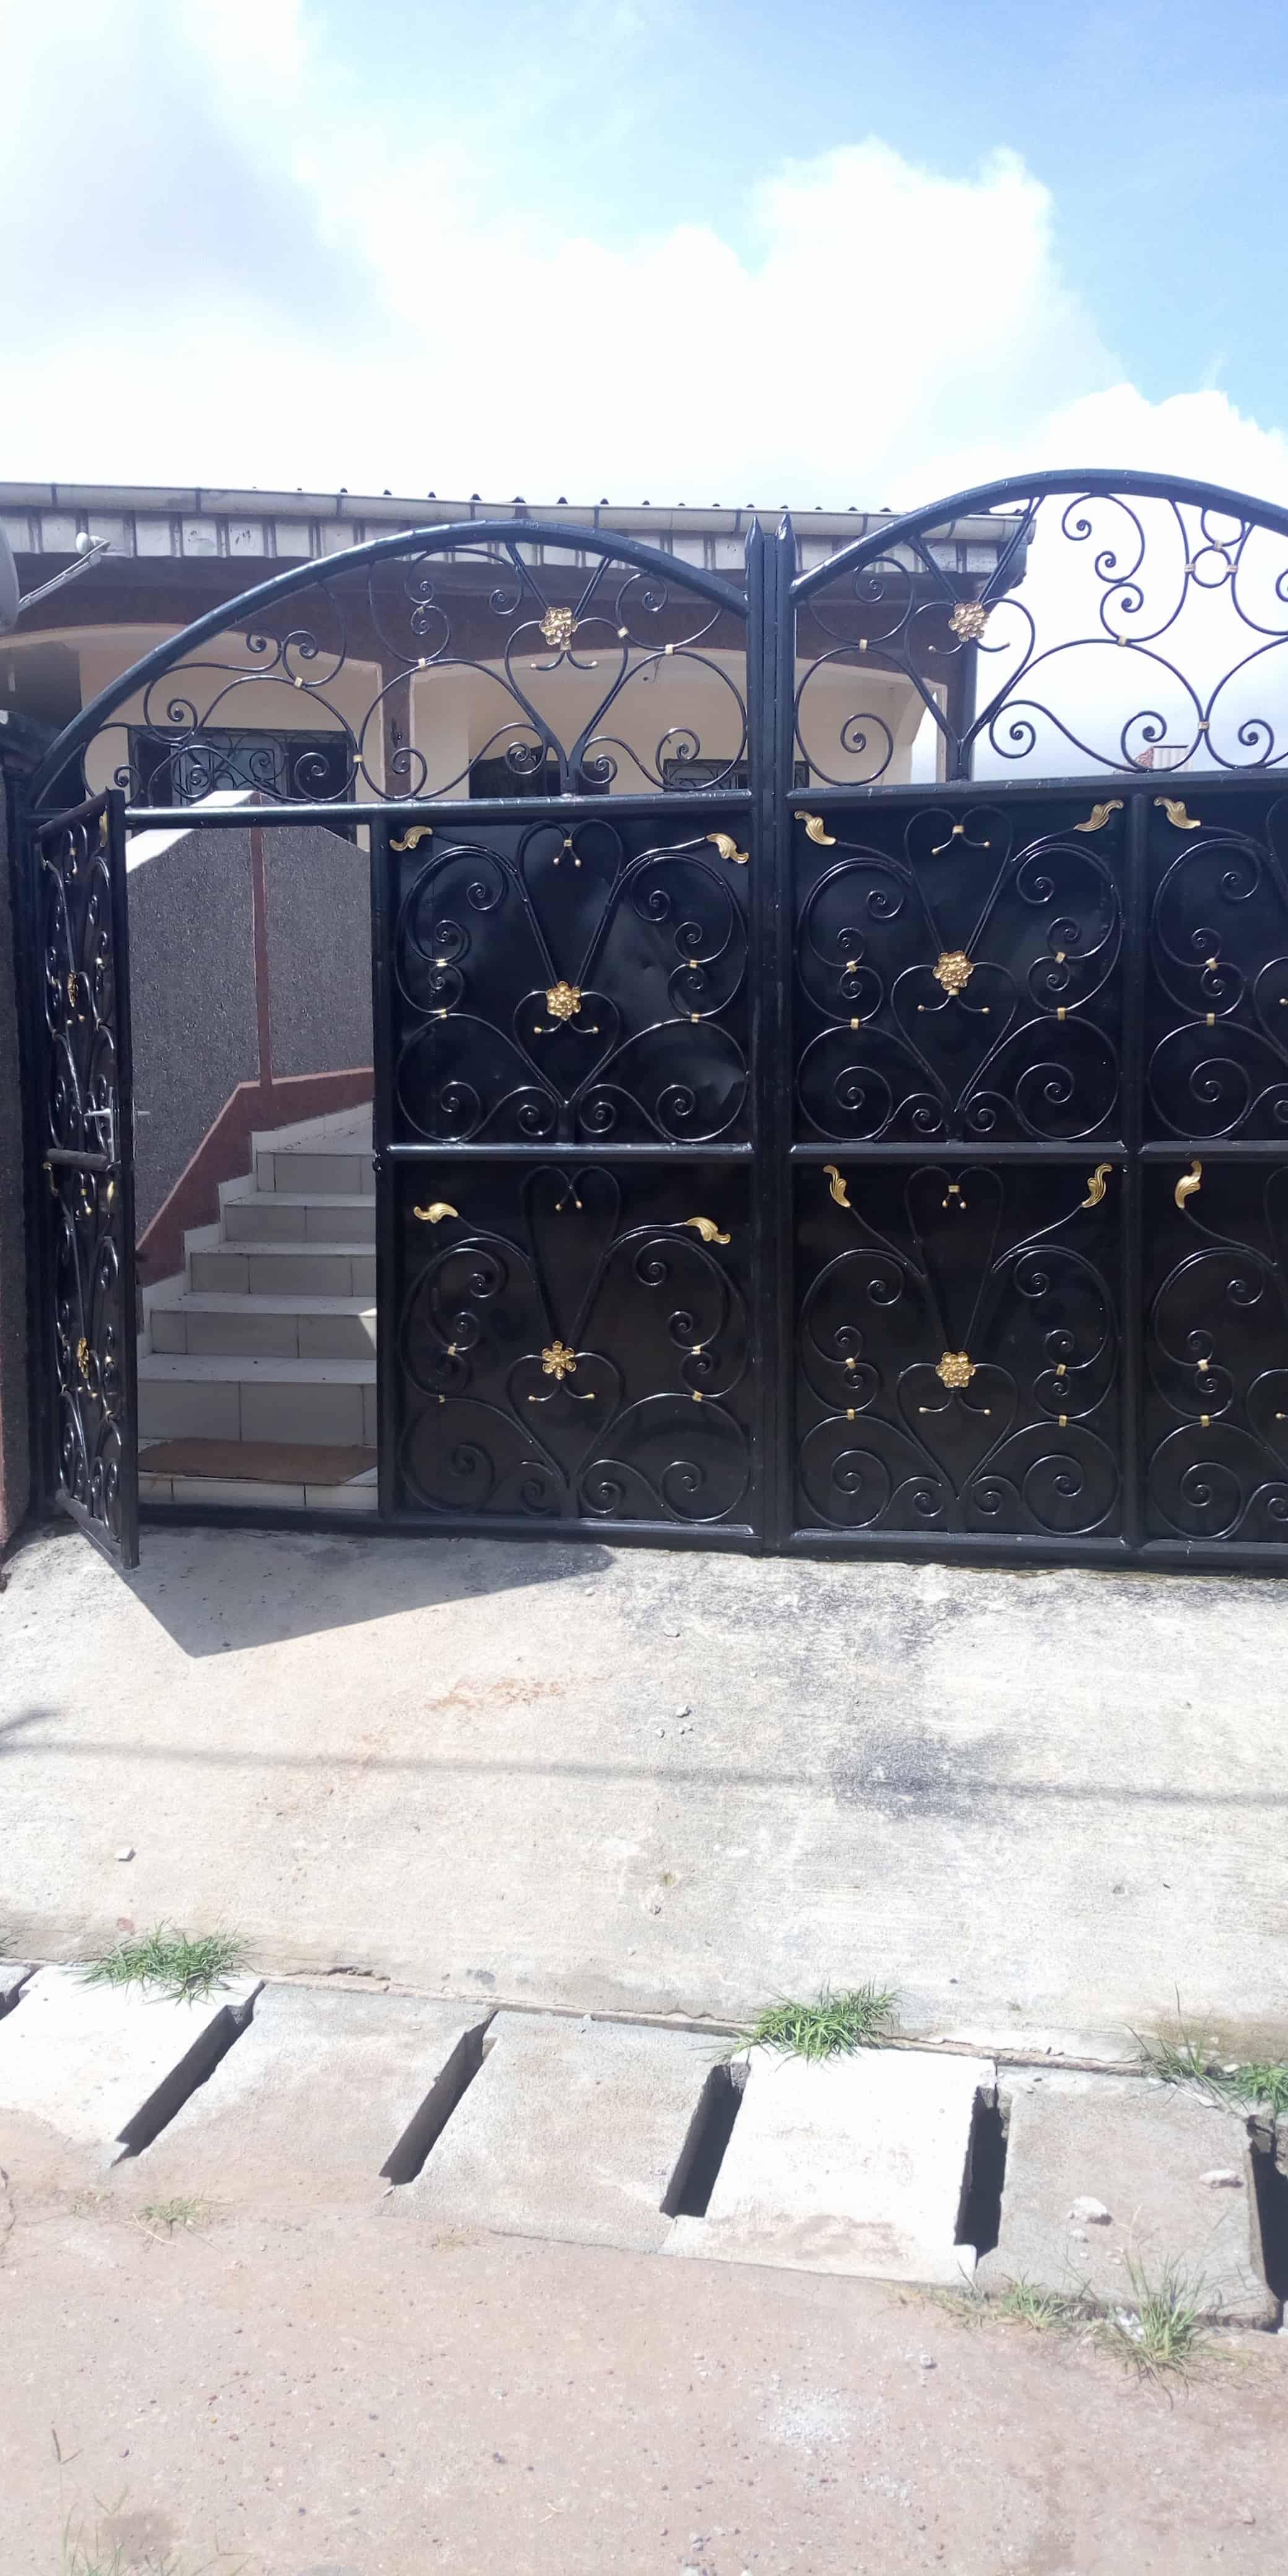 Apartment to rent - Yaoundé, Biyem-Assi, Appartement pour bureau a louer biyem assi yaounde - 1 living room(s), 2 bedroom(s), 1 bathroom(s) - 200 000 FCFA / month